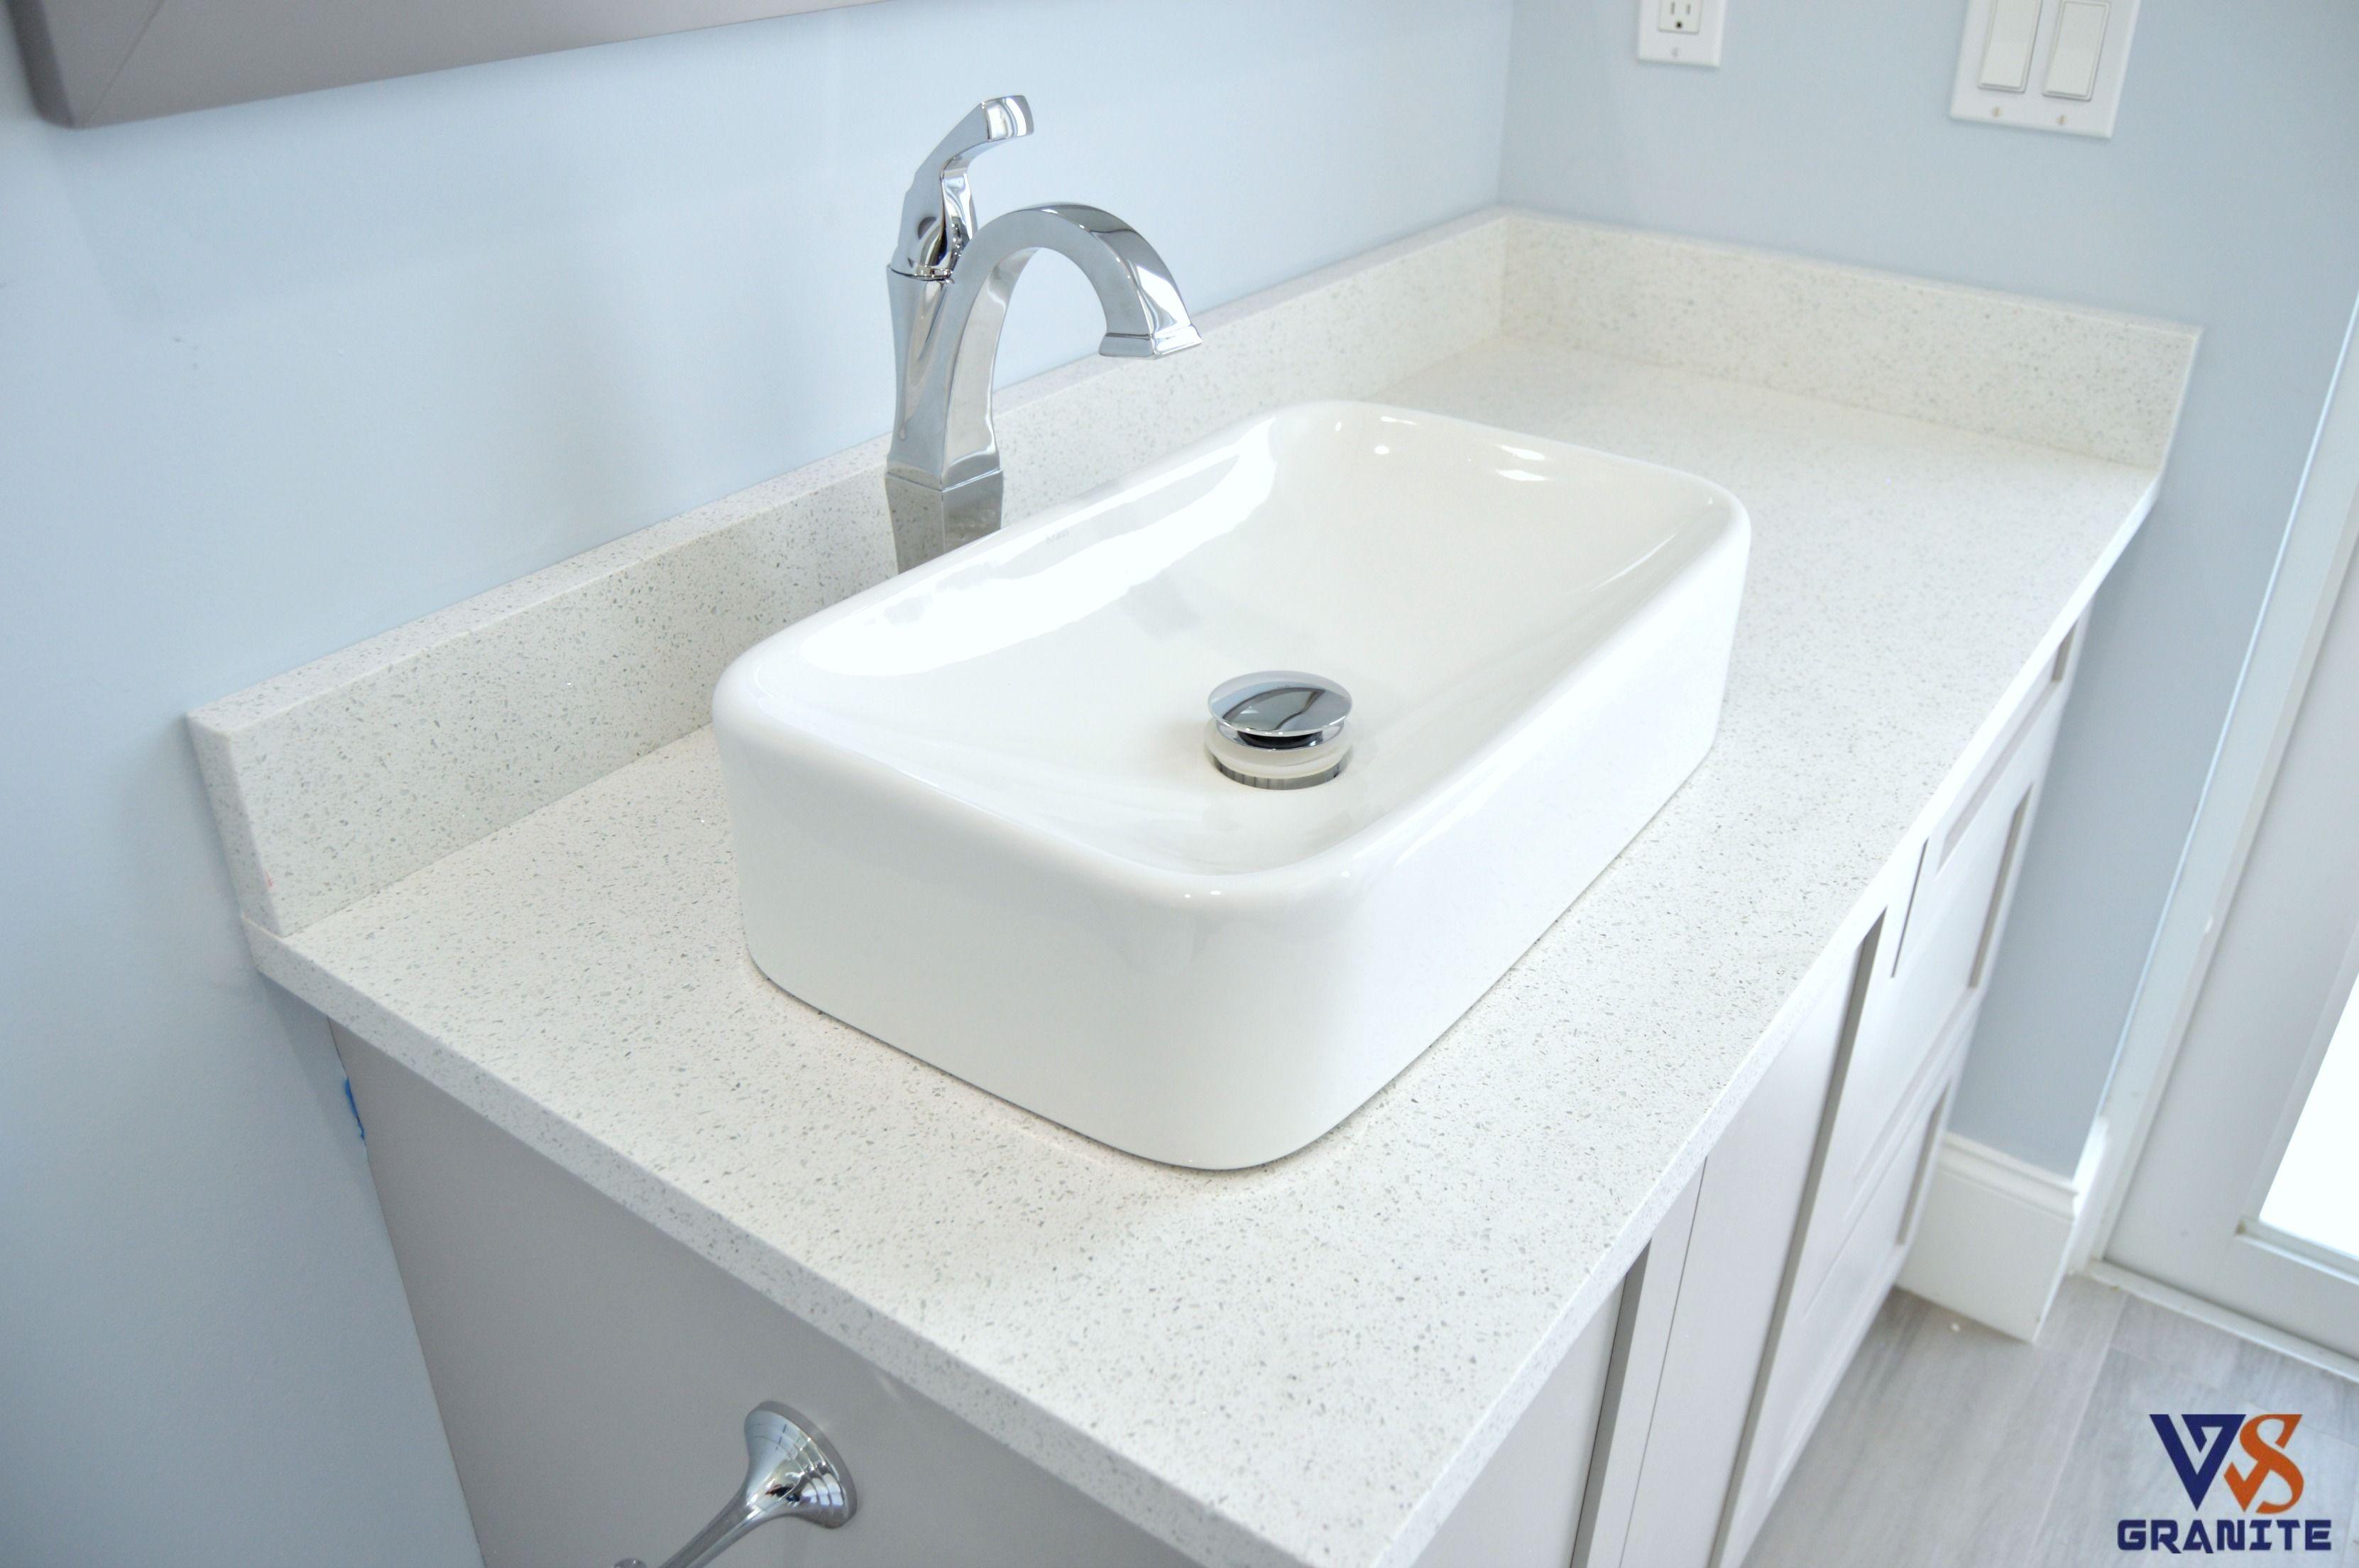 Cabana Bath Material Sparkling White Quartz From Msi With